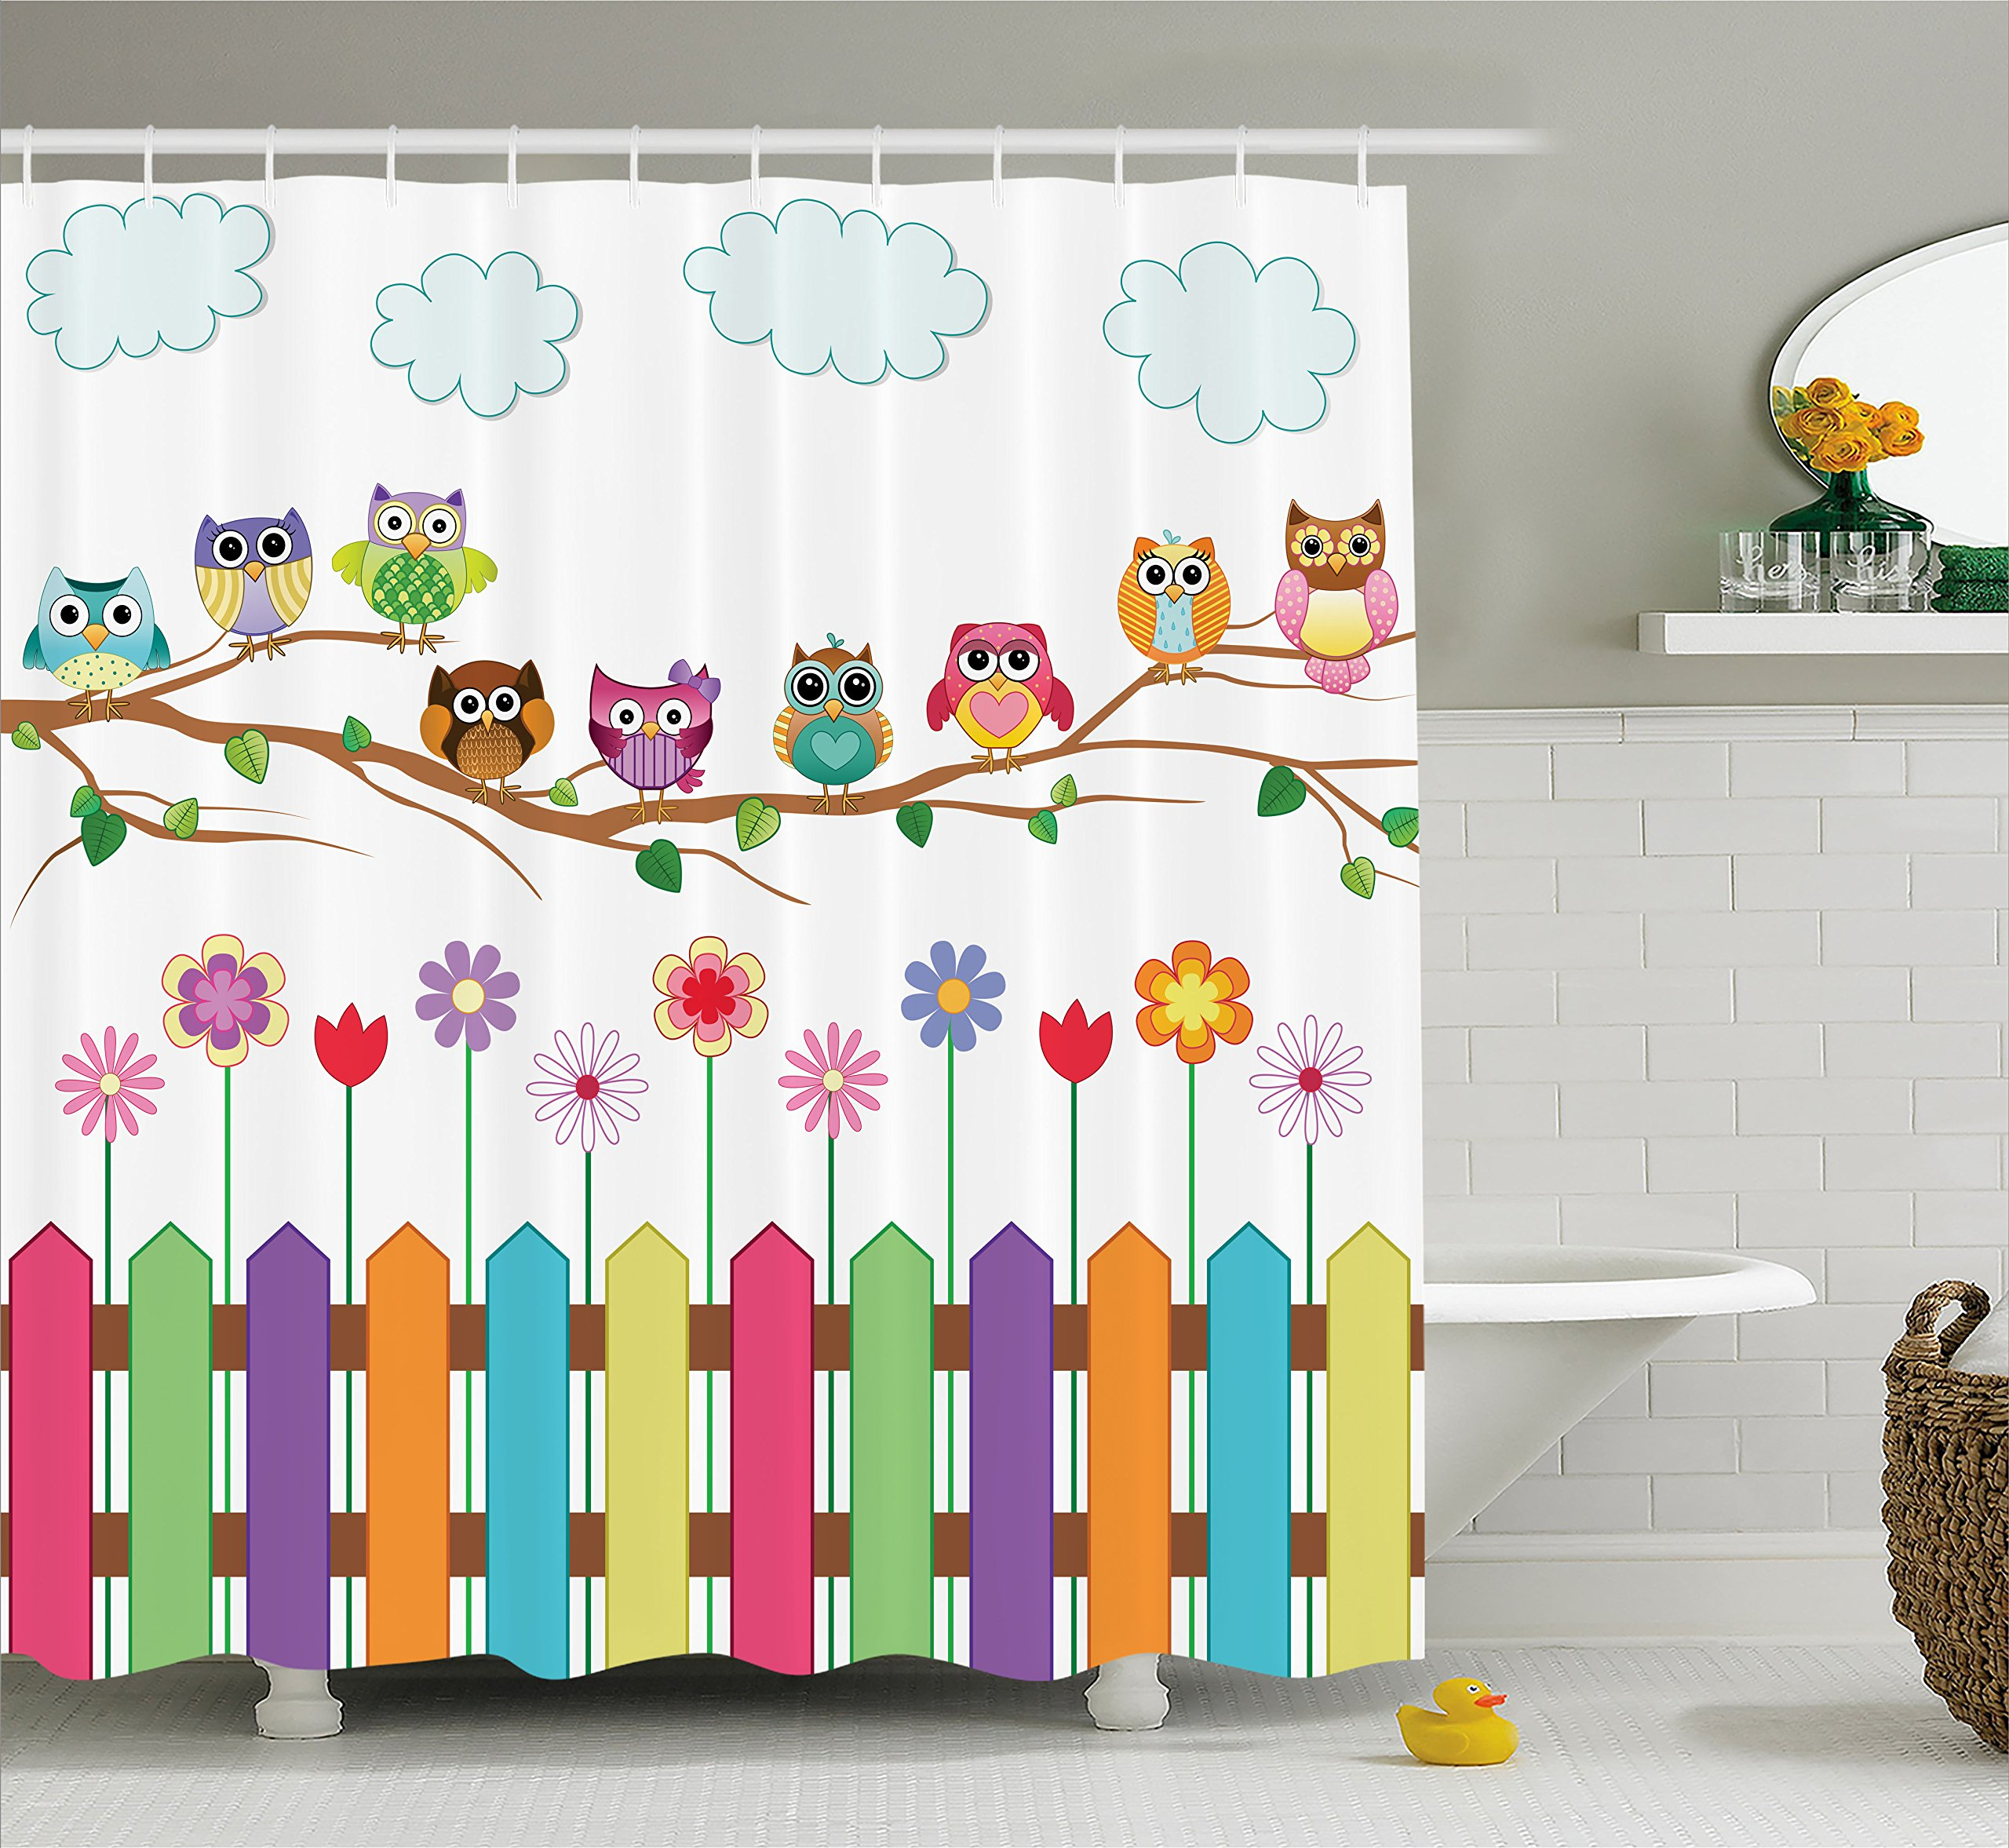 Bathroom Decor Owls: Ambesonne Owls Shower Curtain Set Home Decor By, Owls On A